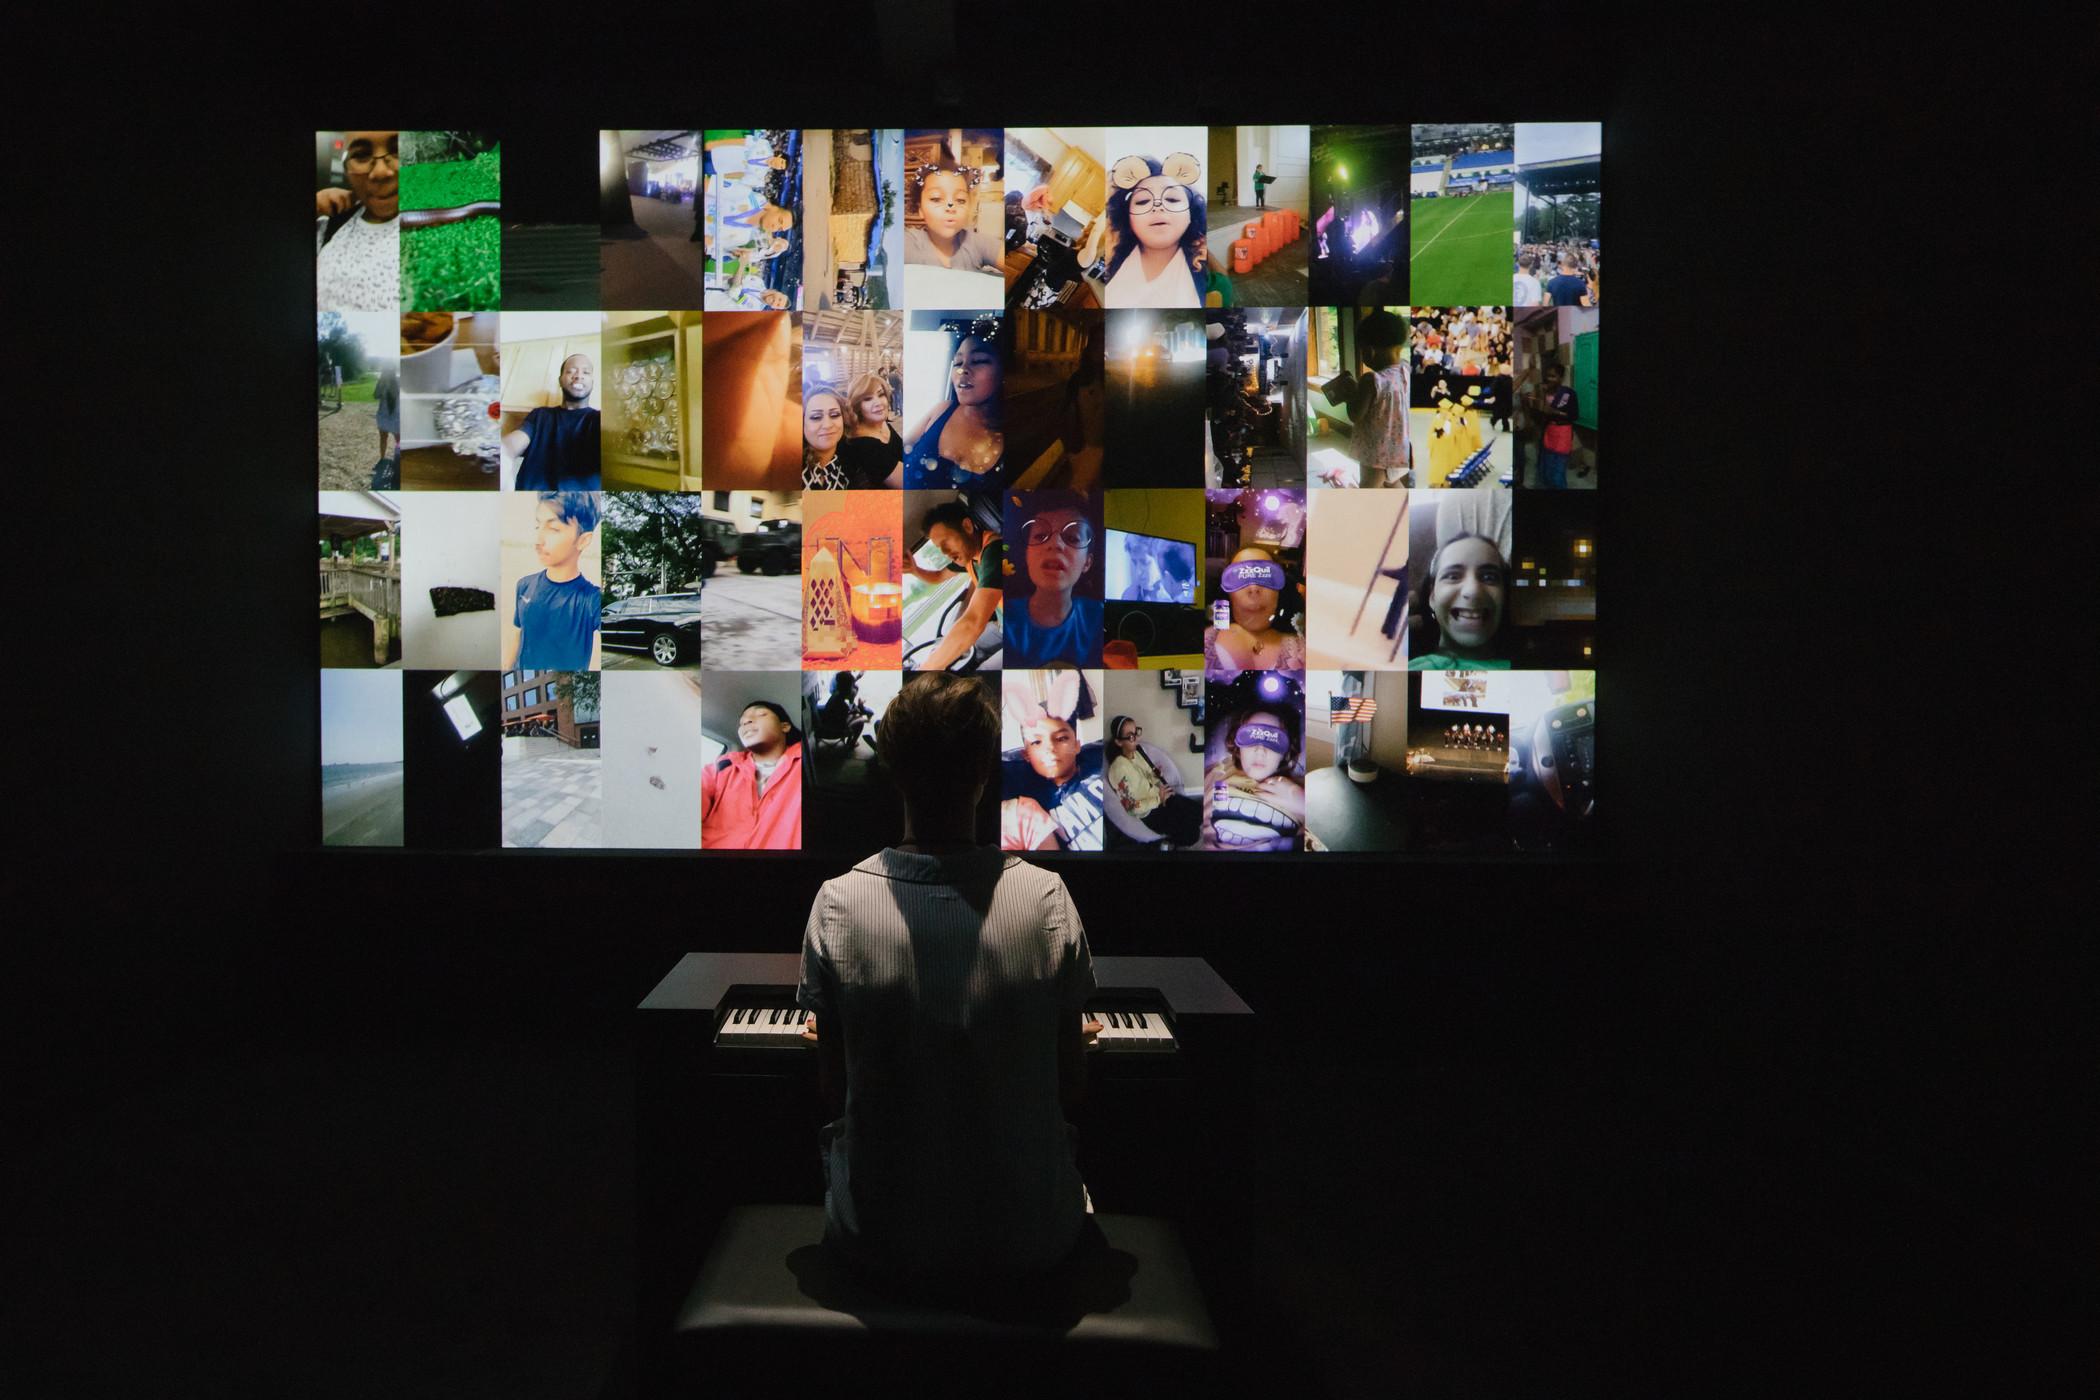 Christian Marclay, The Organ (detail), 2018, installation photograph, Christian Marclay x Snap: Sound Stories at Le Centre d'art La Malmaison, Cannes, © 2019